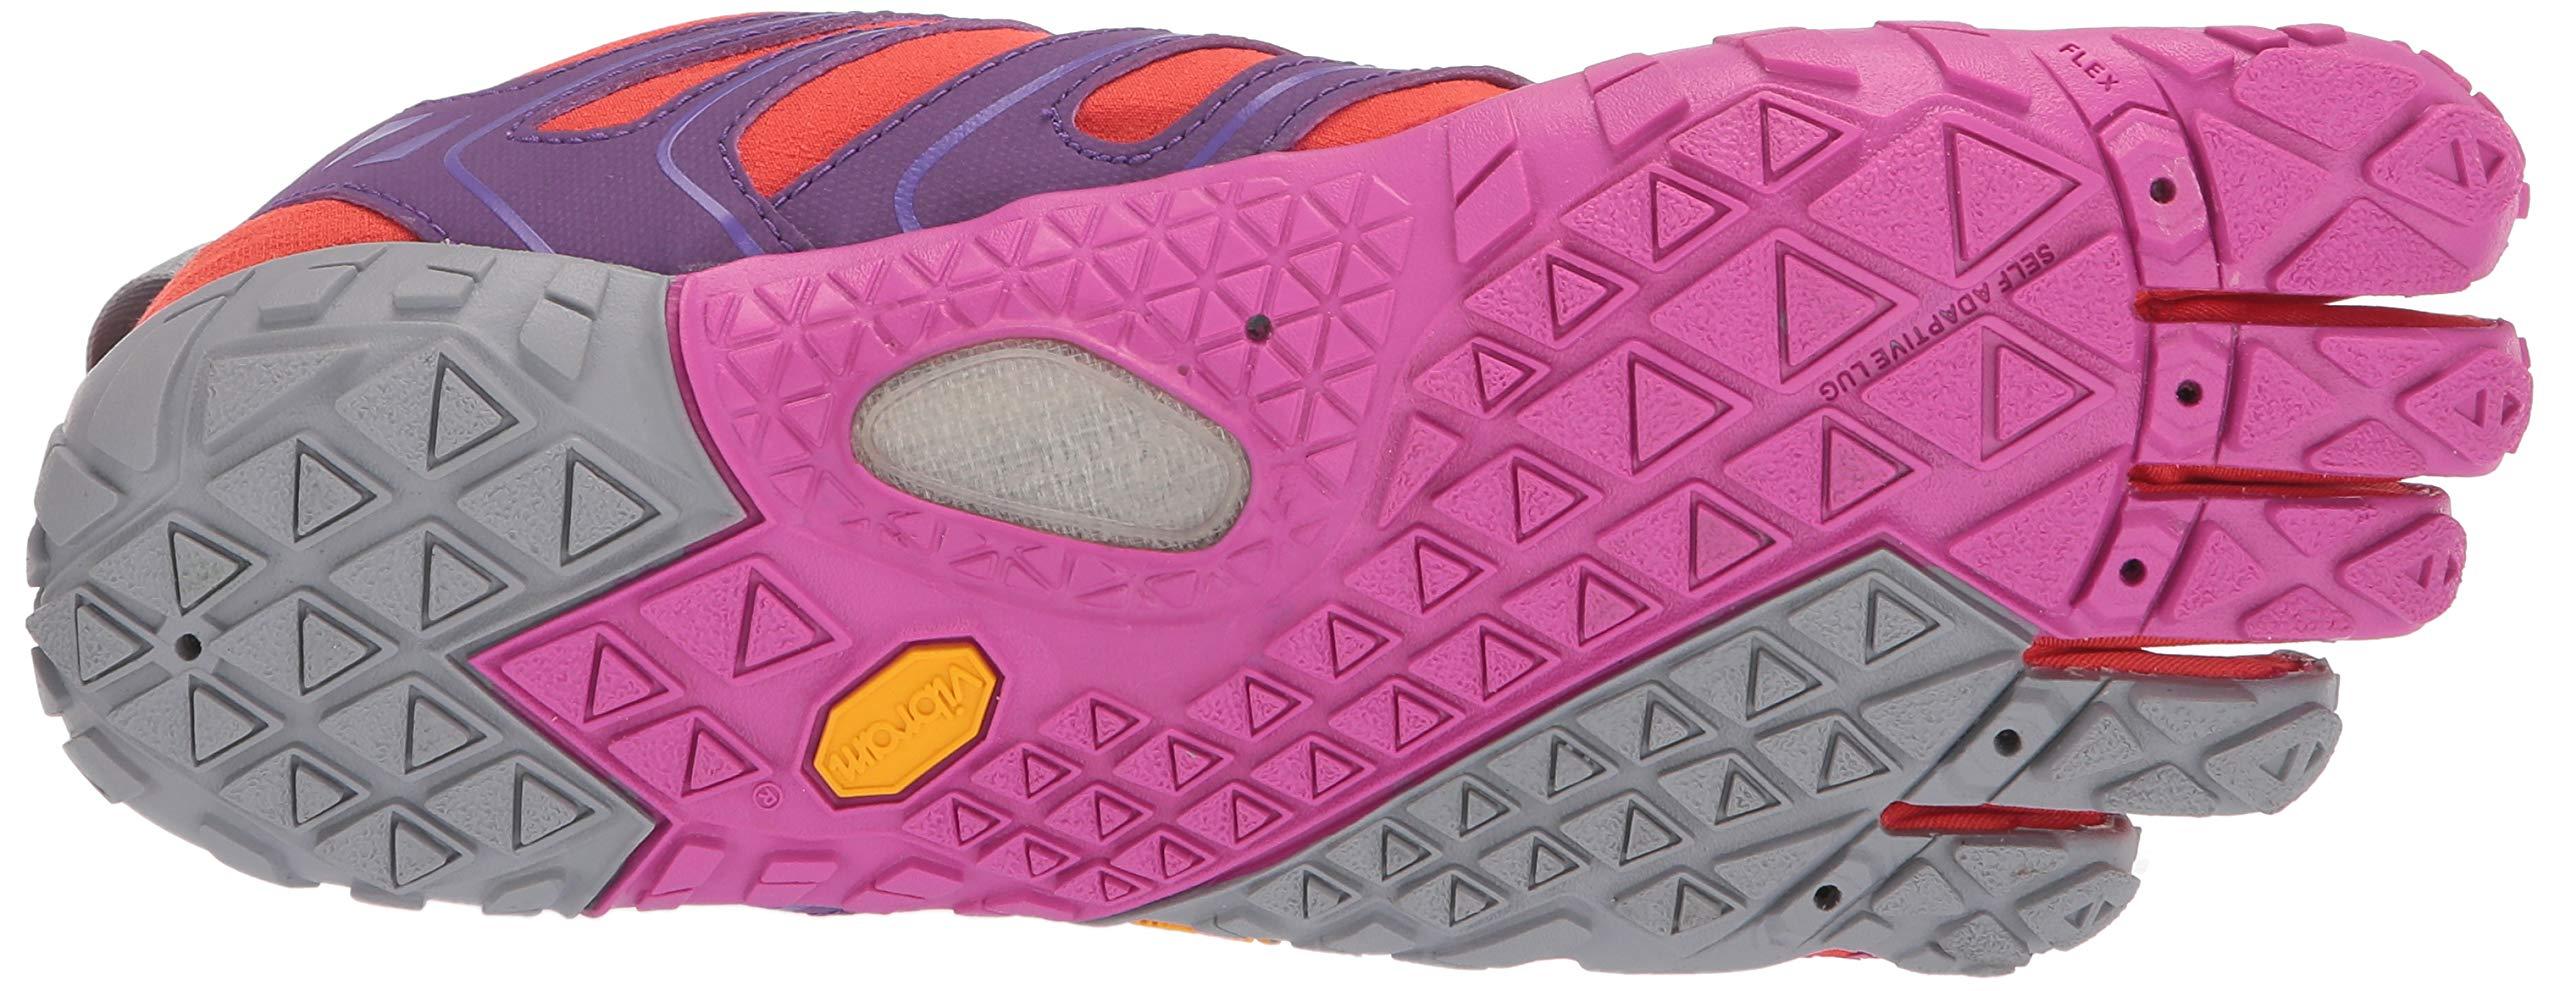 Vibram FiveFingers V-Trail, Women's Trail Running Shoes, Orange (Magenta/Orange), 6-6.5 UK (38 EU) by Vibram (Image #3)